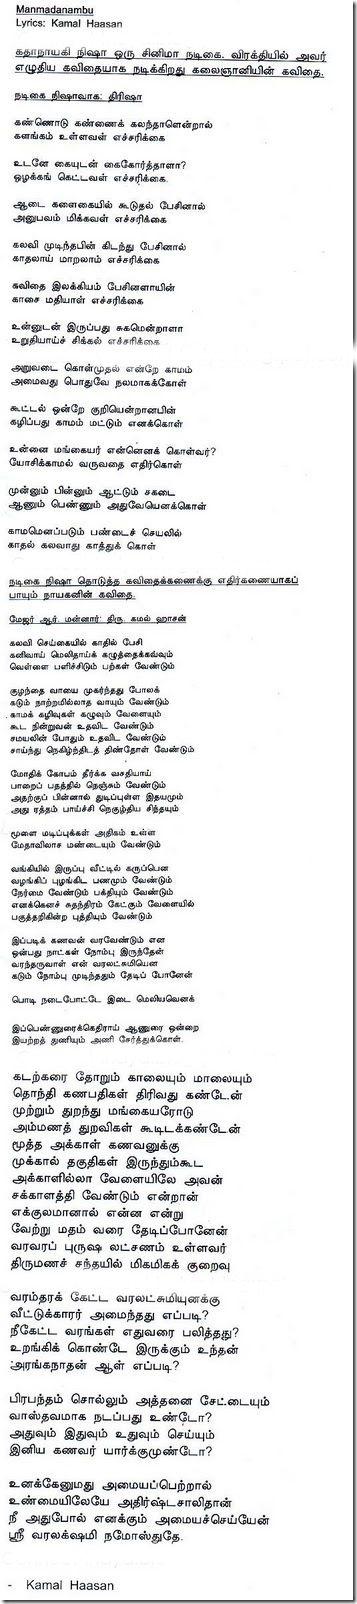 manmadhan_ambu Poem exchange. Men's warning to another and a woman's prayer to goddess.  translation wud be  http://www.ramyuva.com/voice-of-the-winds/kamal-kavidhai-lyrics-translation-in-english/